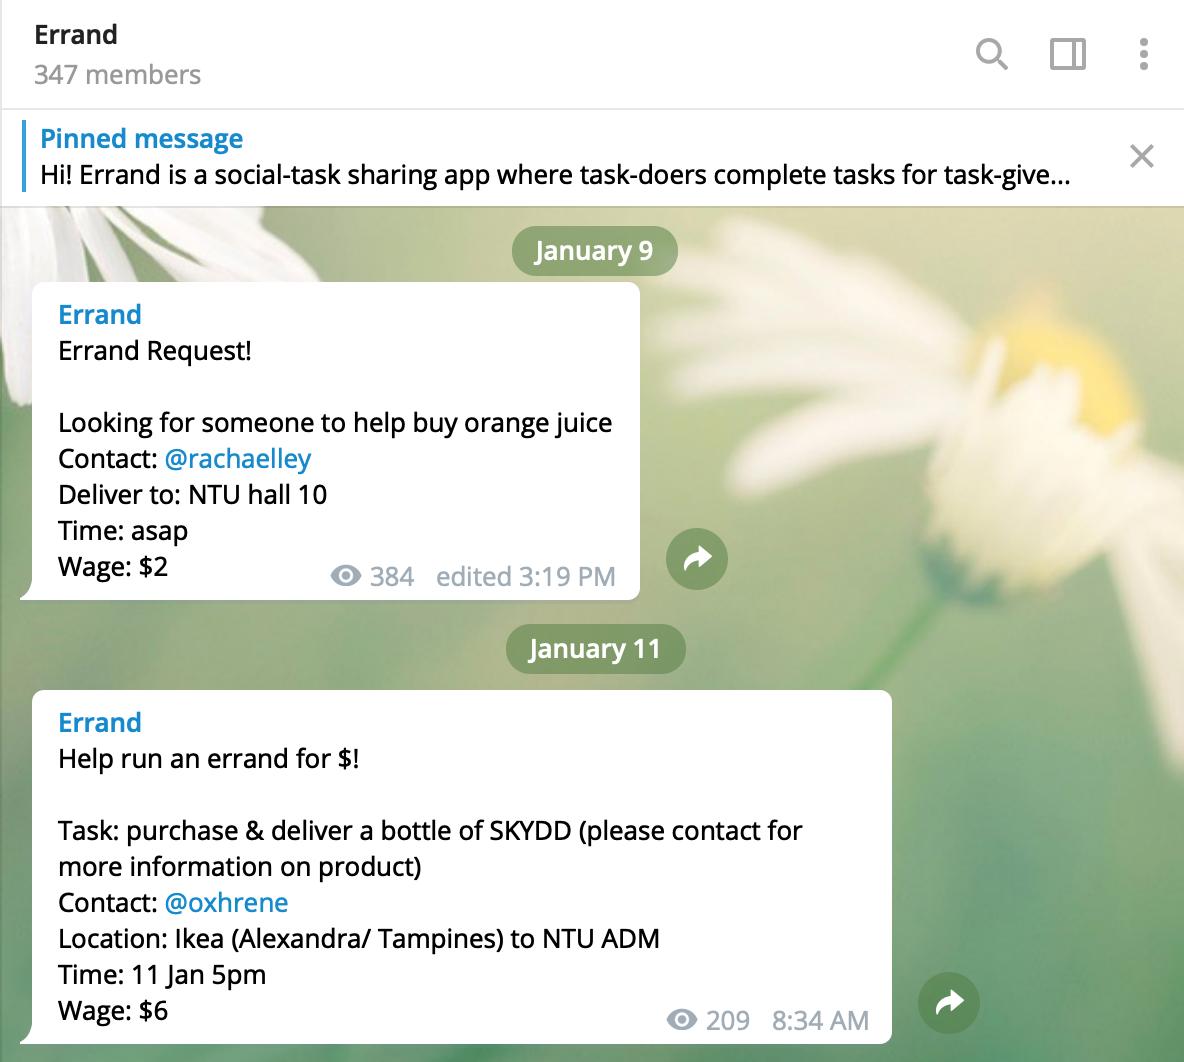 Errand_Telegram.png